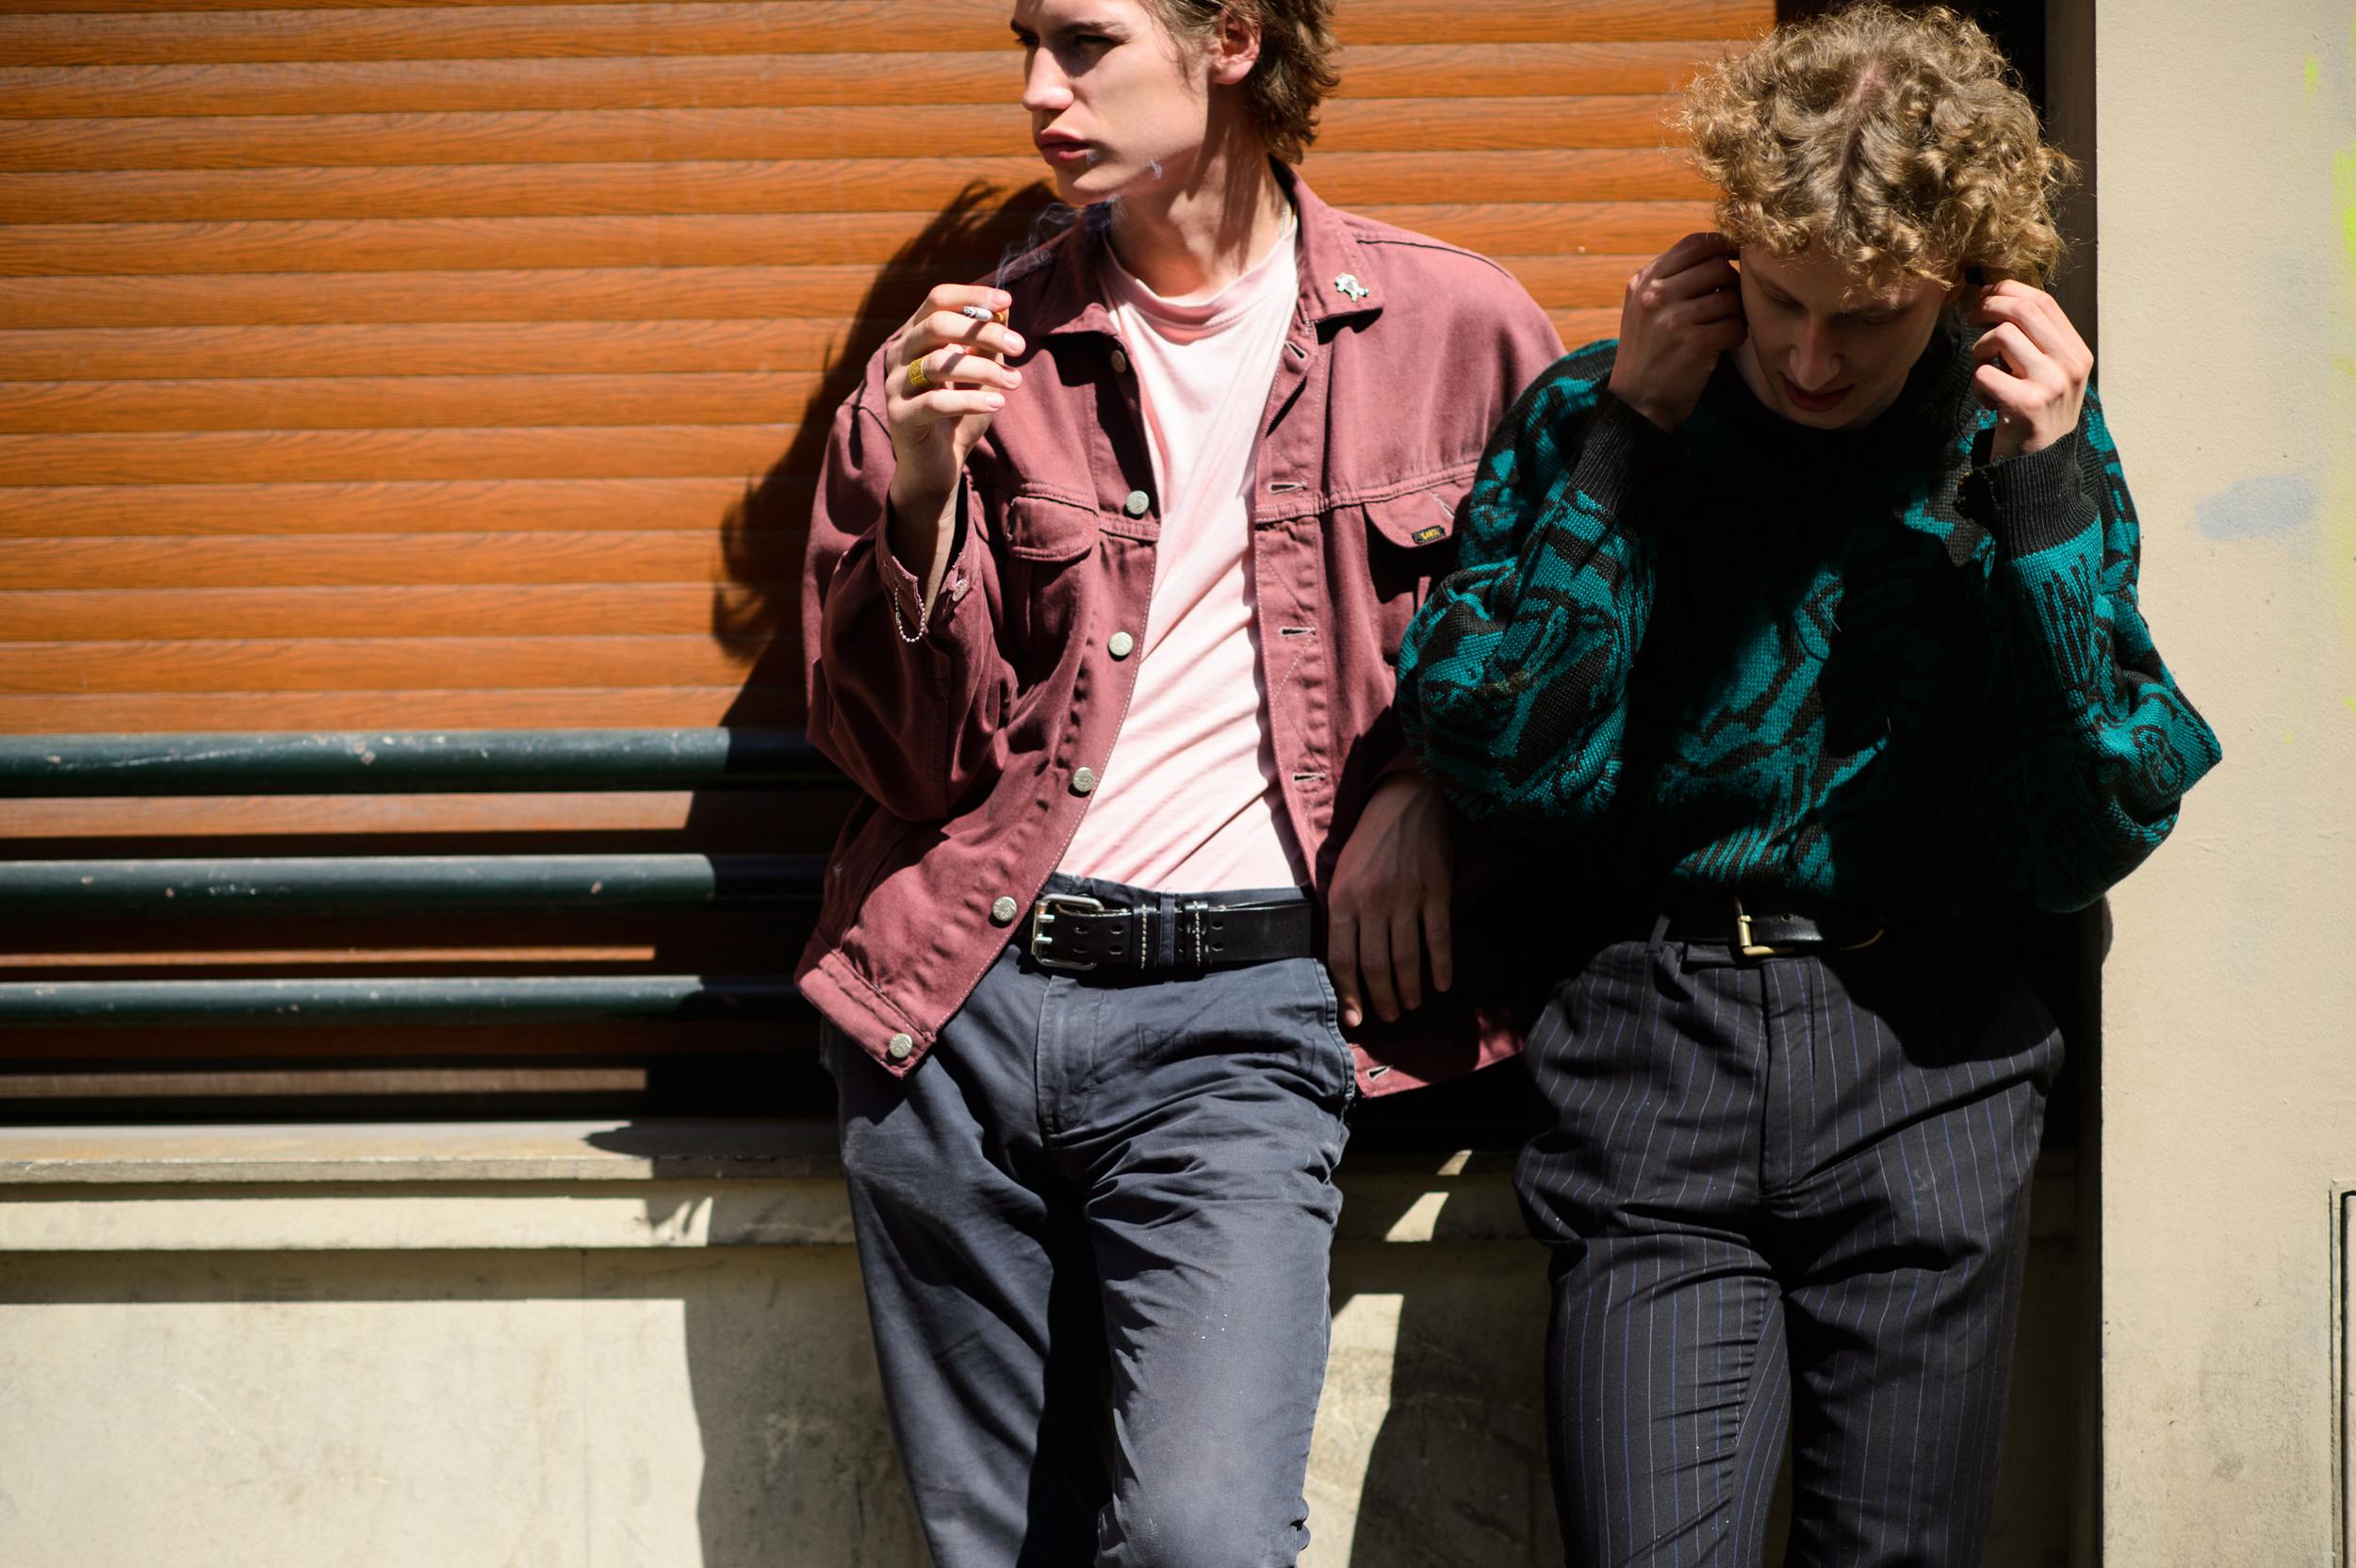 Street style for Le 21ème at Paris Men's Fashion Week, Spring/Summer 2016.